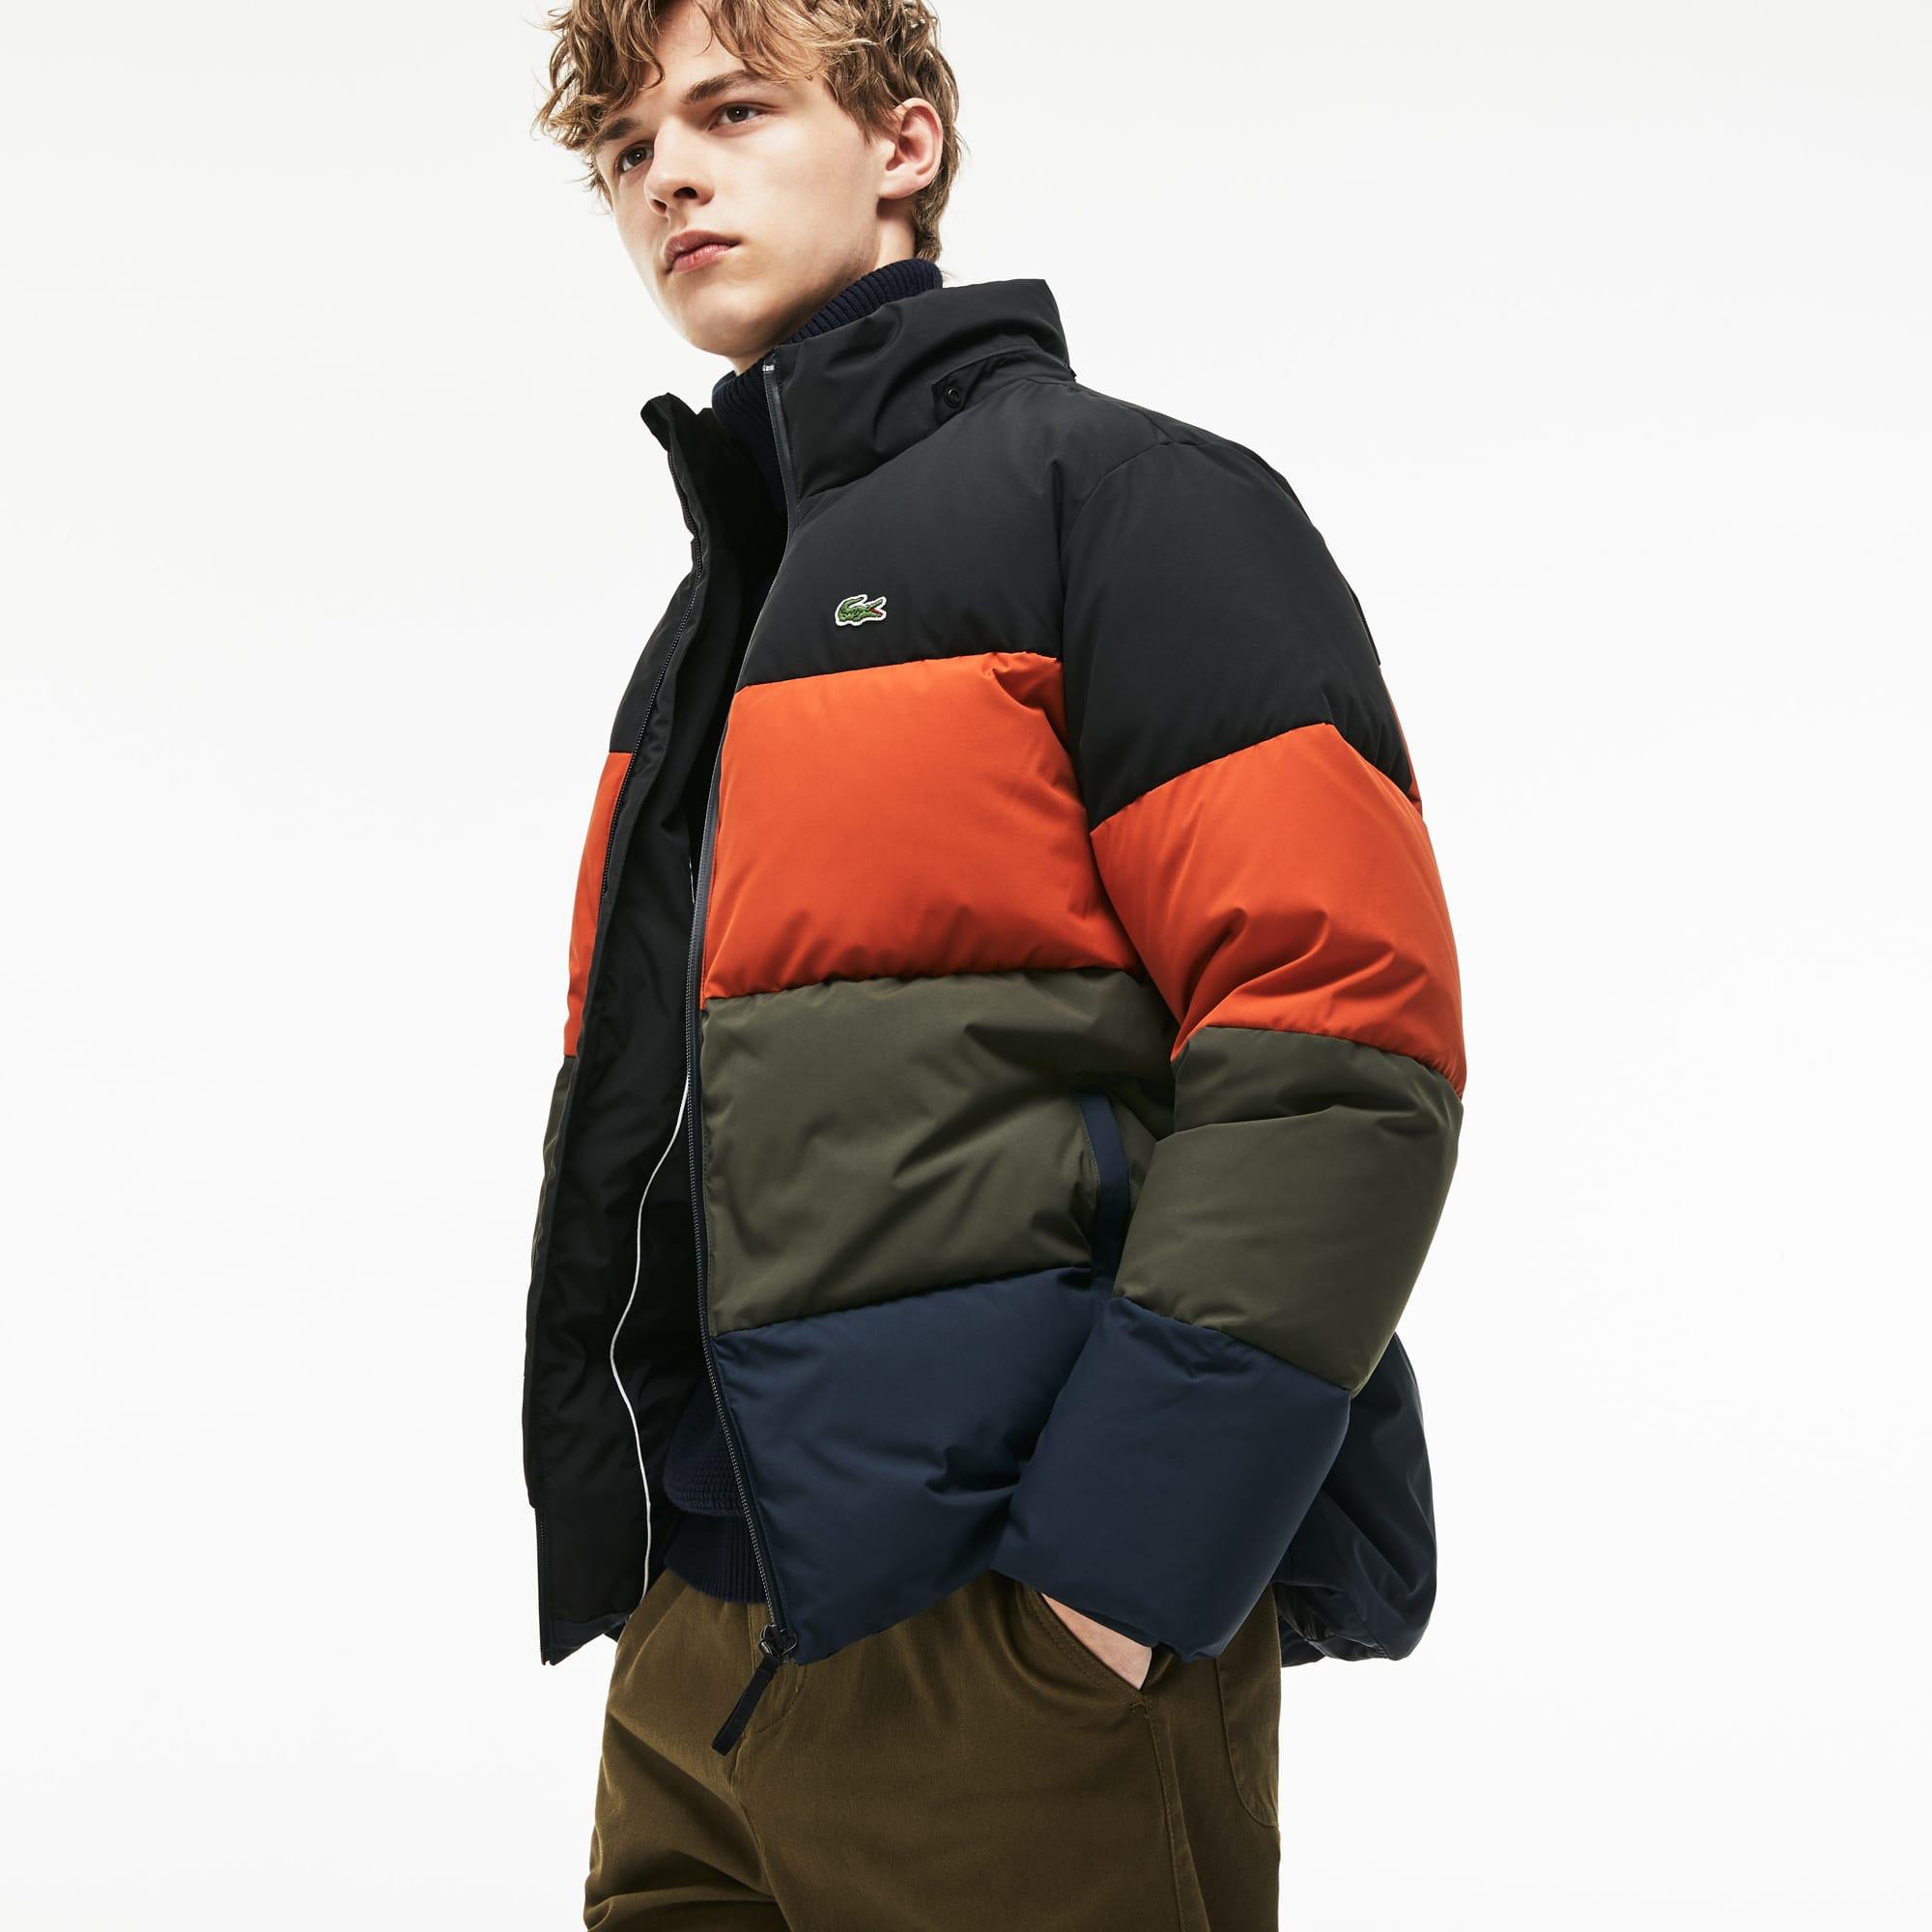 bd262c721865 Men s Detachable Hood Quilted Water-Resistant Taffeta Jacket ...